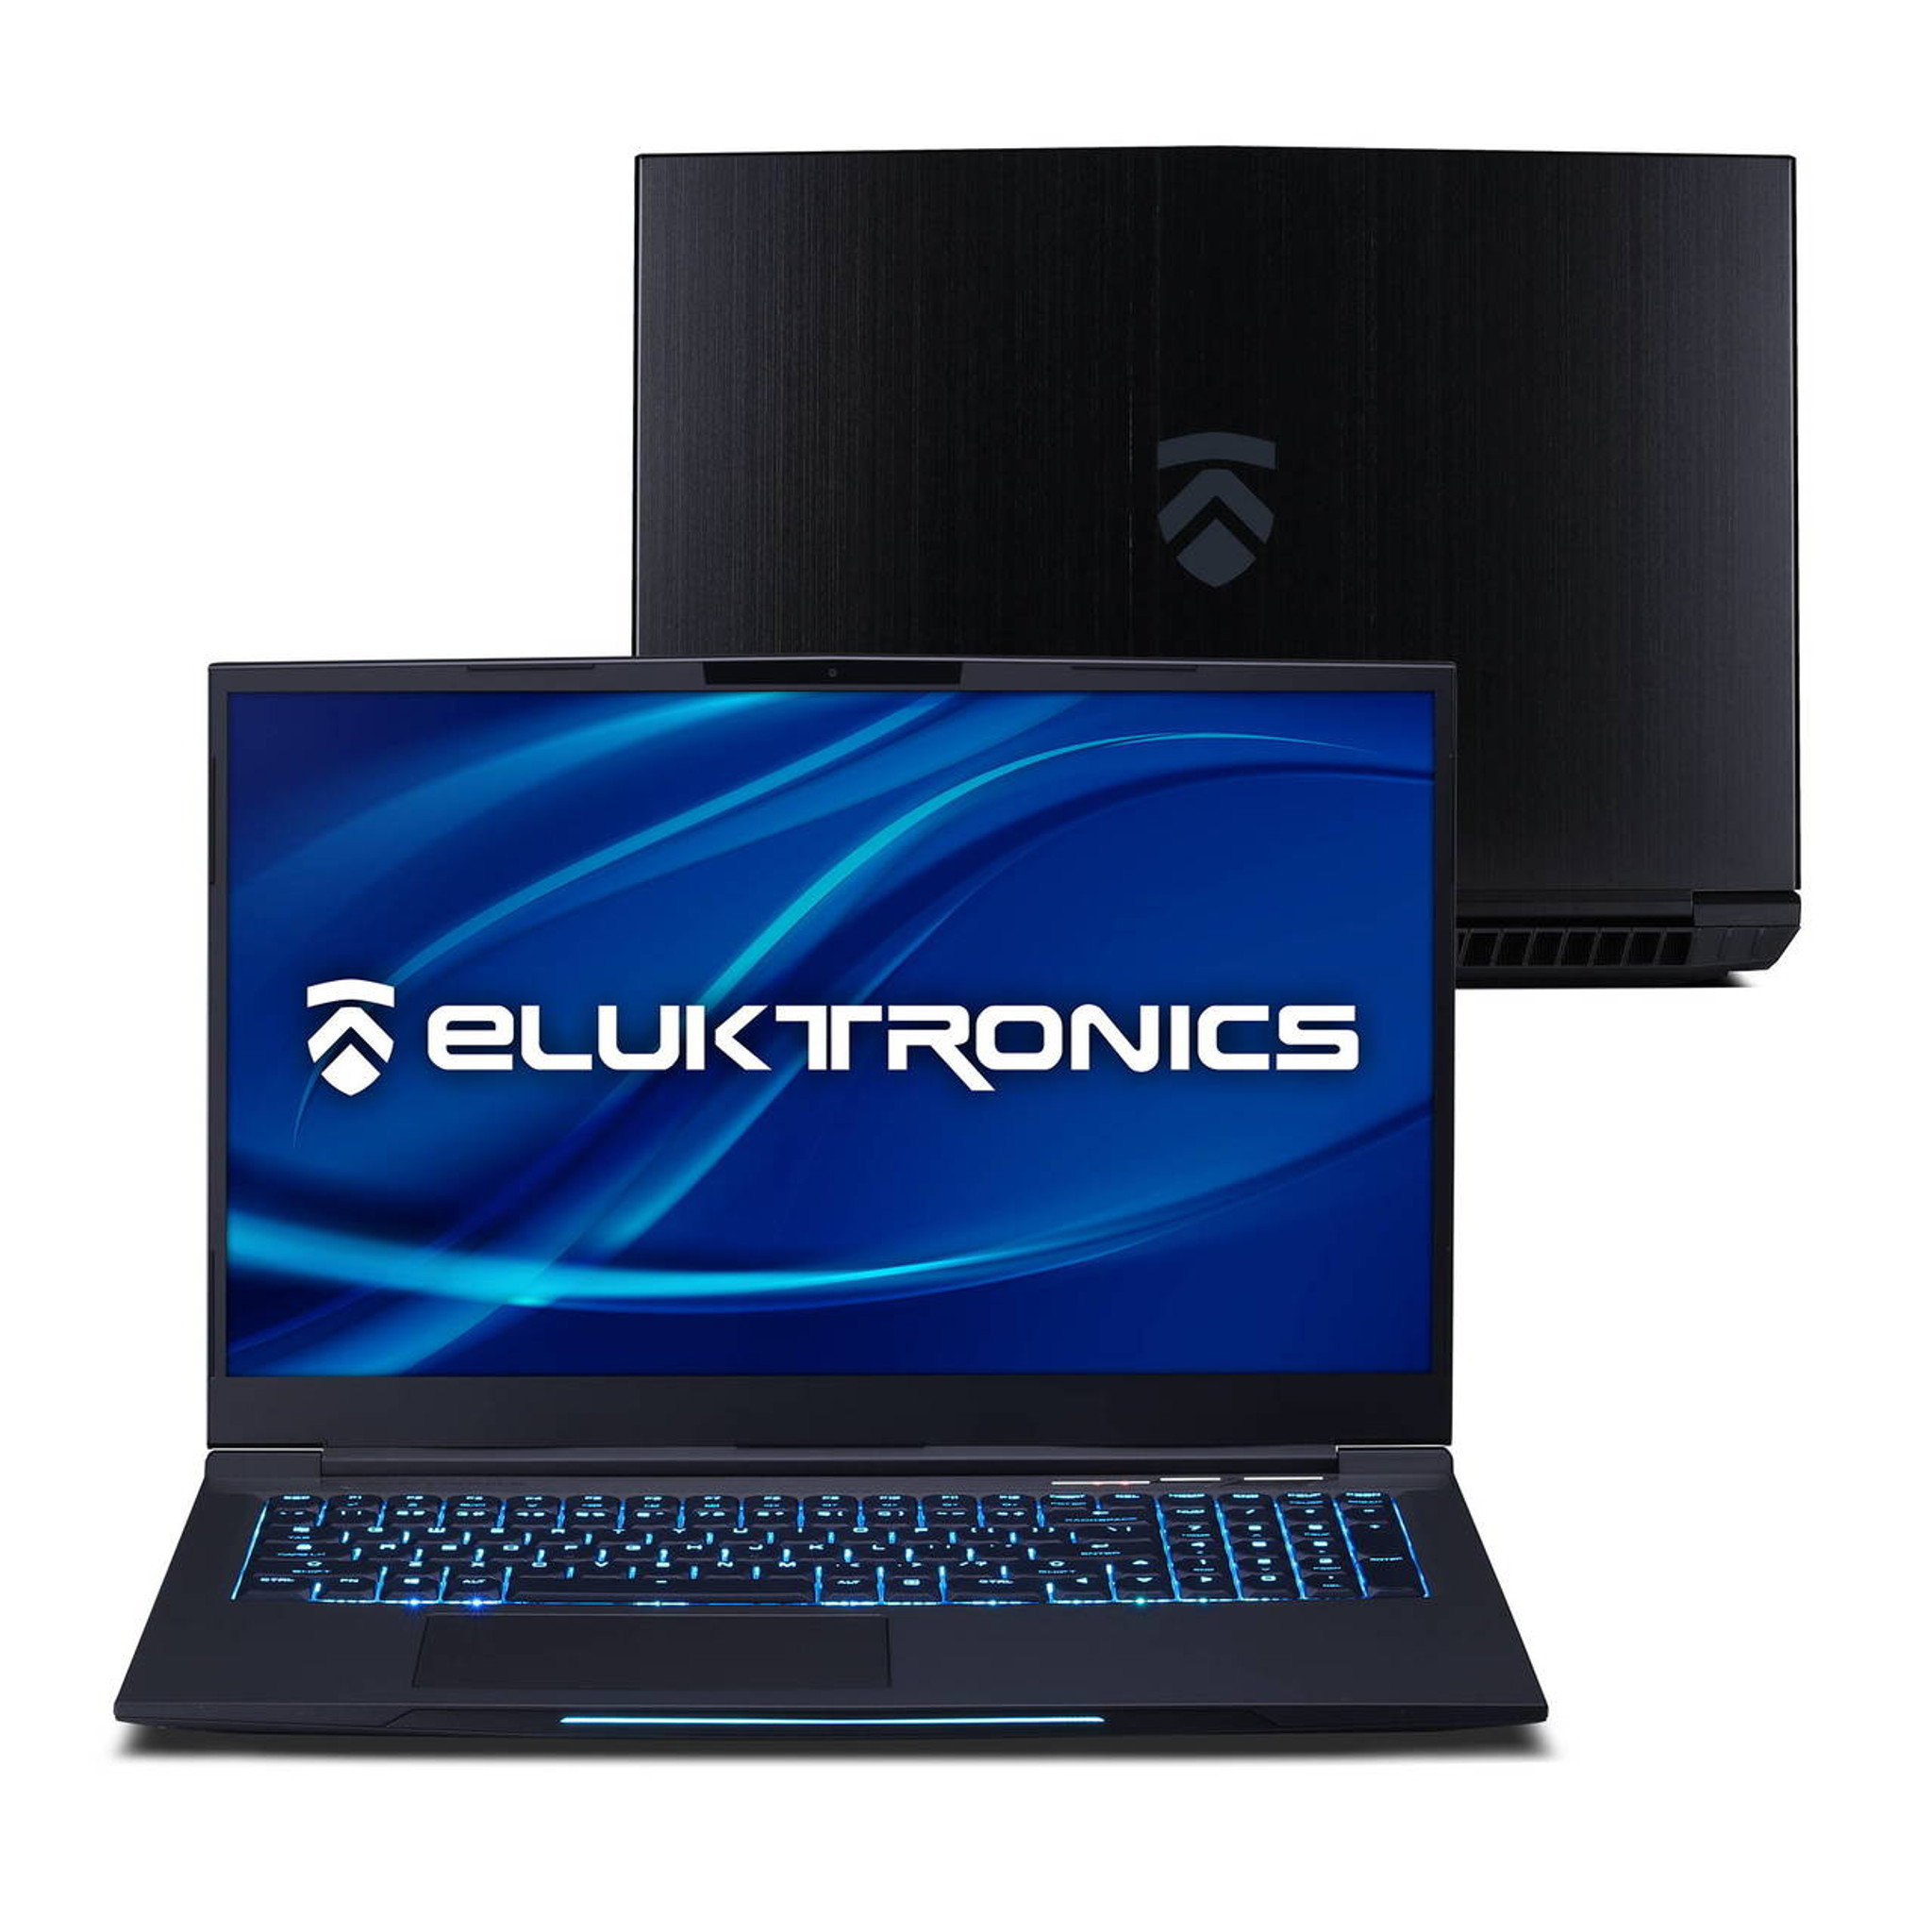 Eluktronics MECH-17 G1R Slim & Light Series 17 3-Inch Premium Gaming Laptop  with per-key RGB Mechanical Keyboard (Up to NVIDIA® GeForce® RTX 2070)